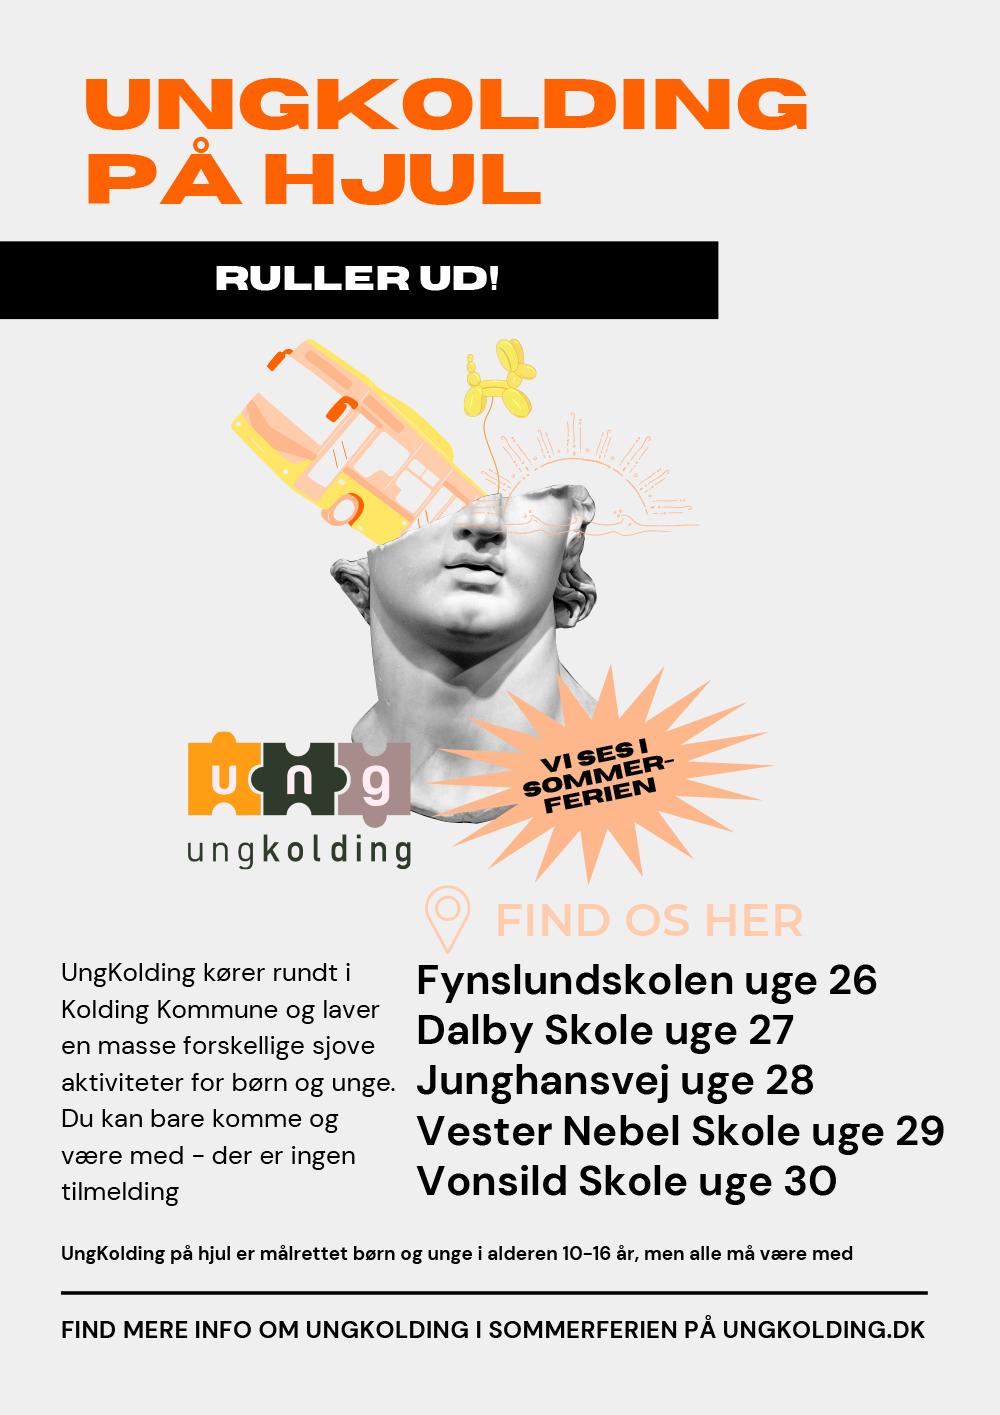 UngKolding på hjul sommer 2021